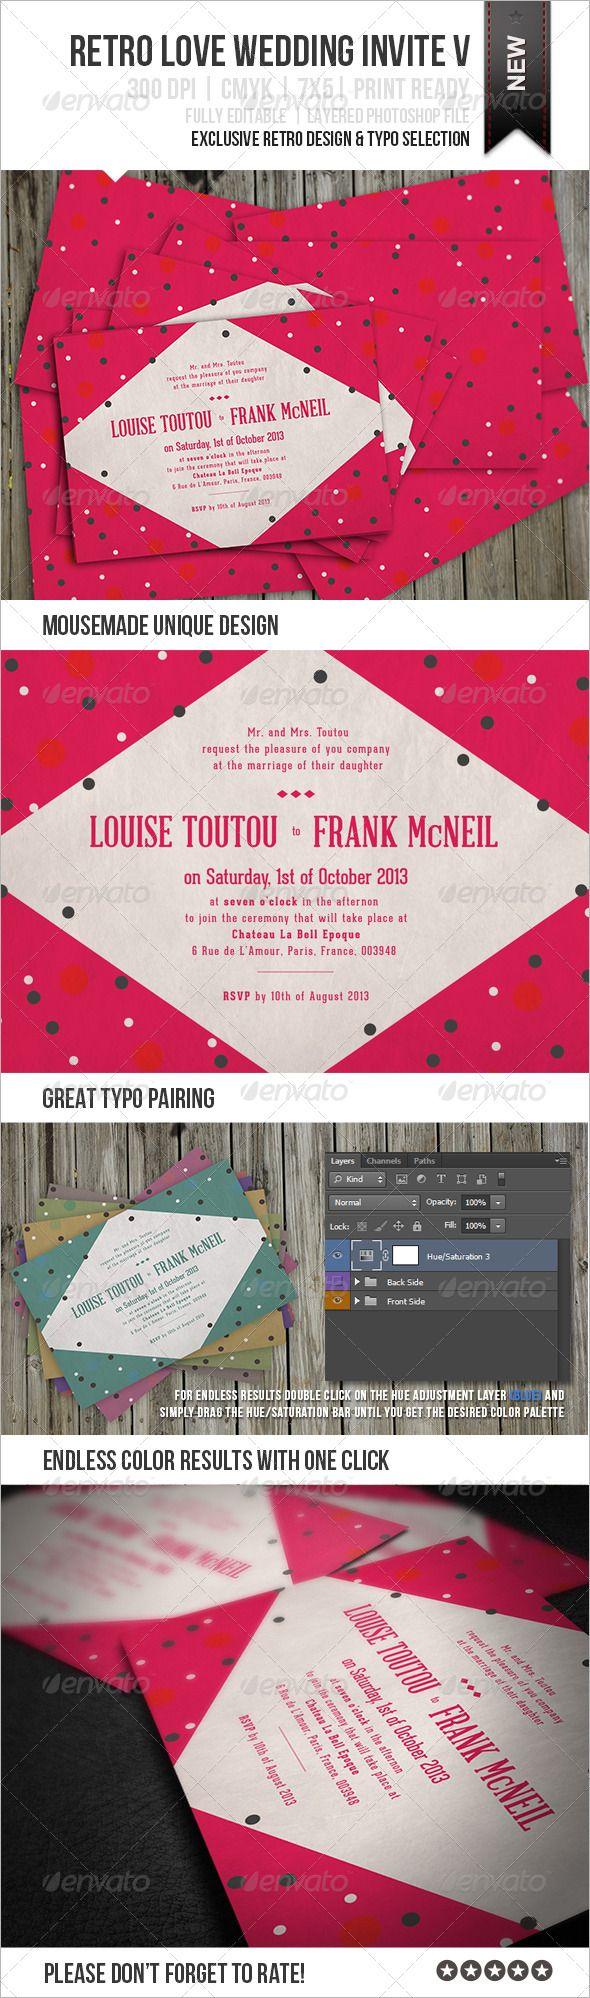 16 best Invitation Card images on Pinterest | Wedding cards ...